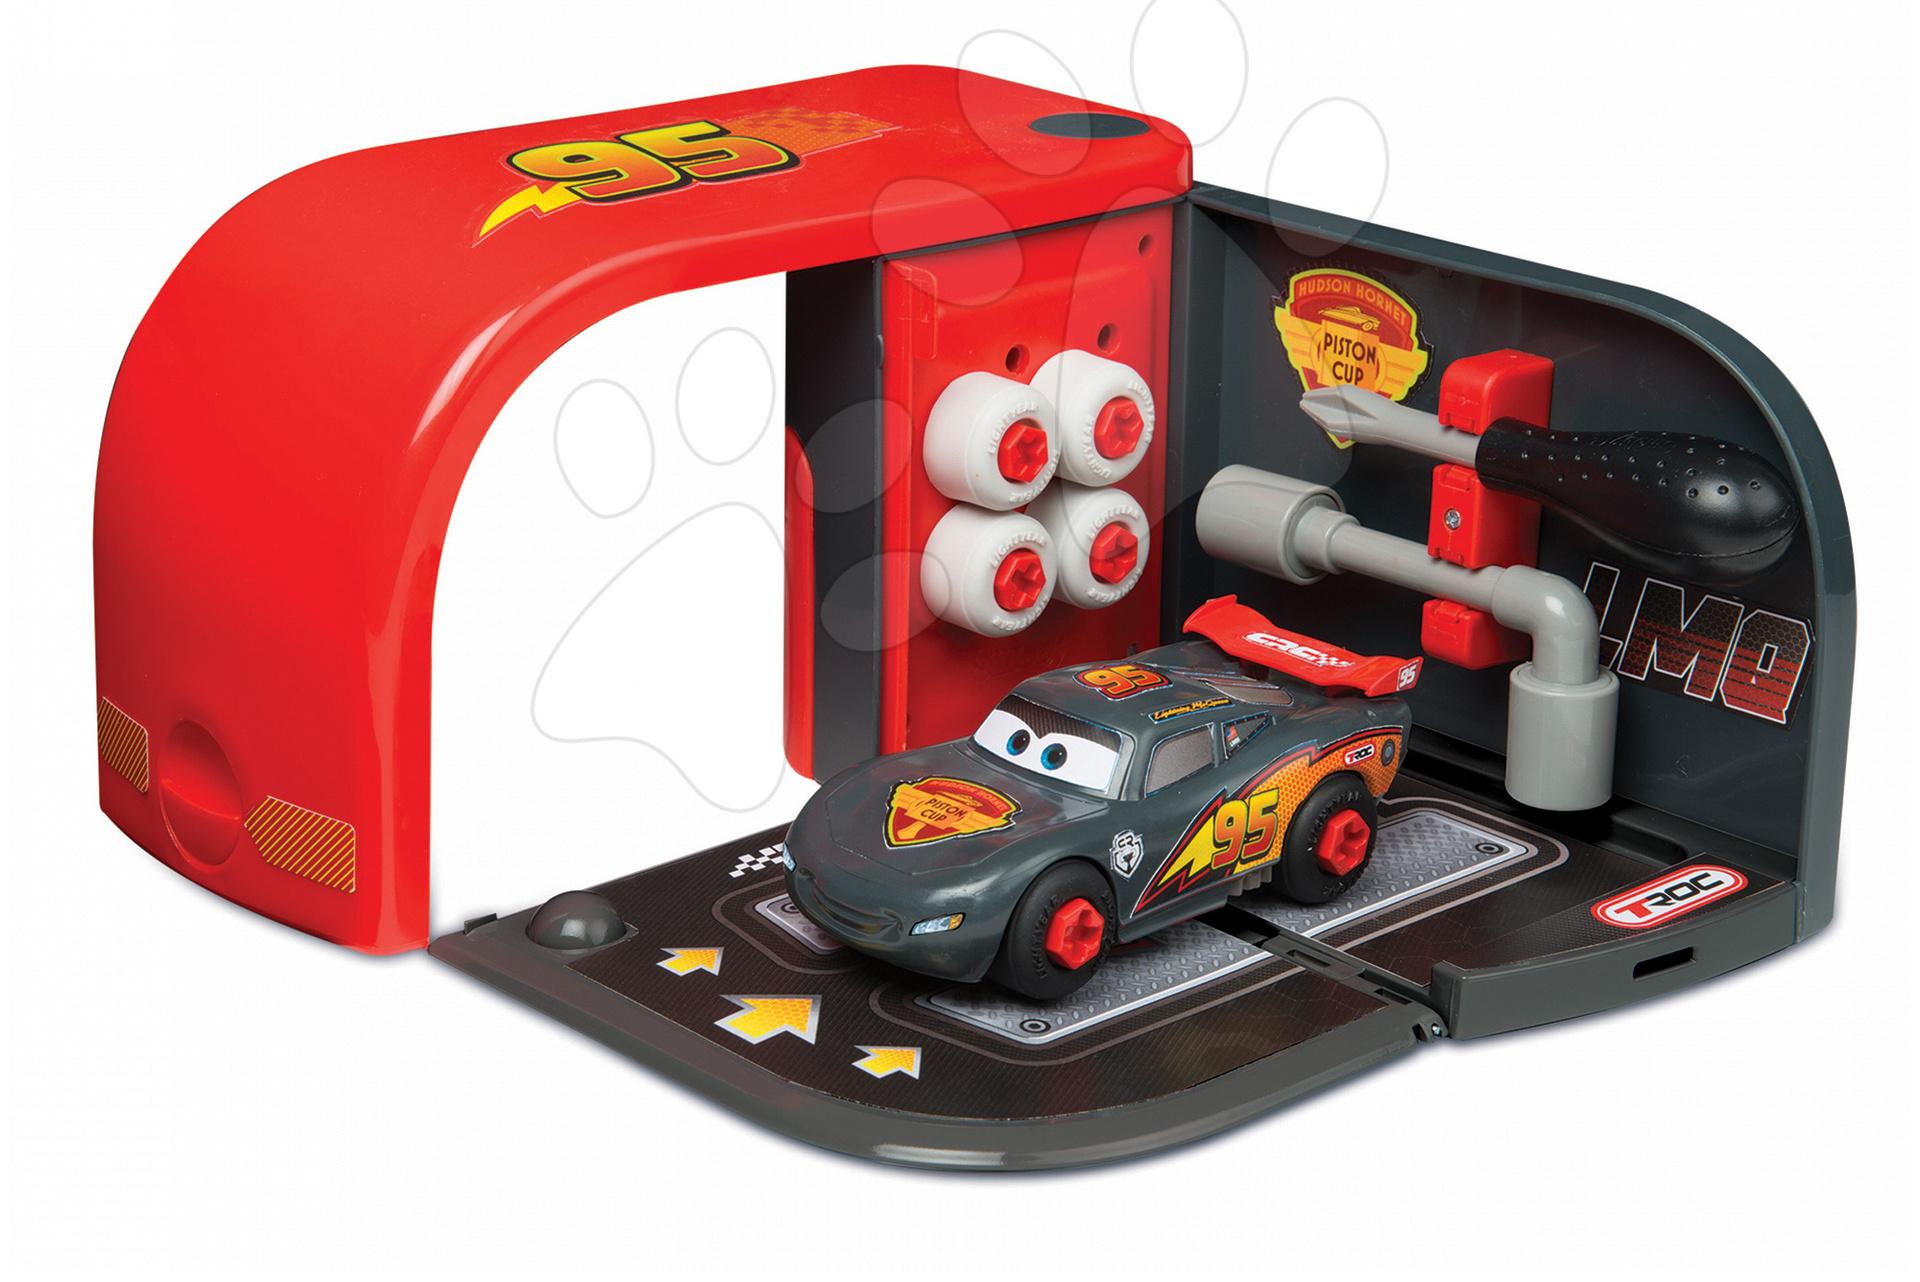 Pracovná detská dielňa - Autoservis Autá Carbon Smoby s náradím a autom McQueen v kufríku